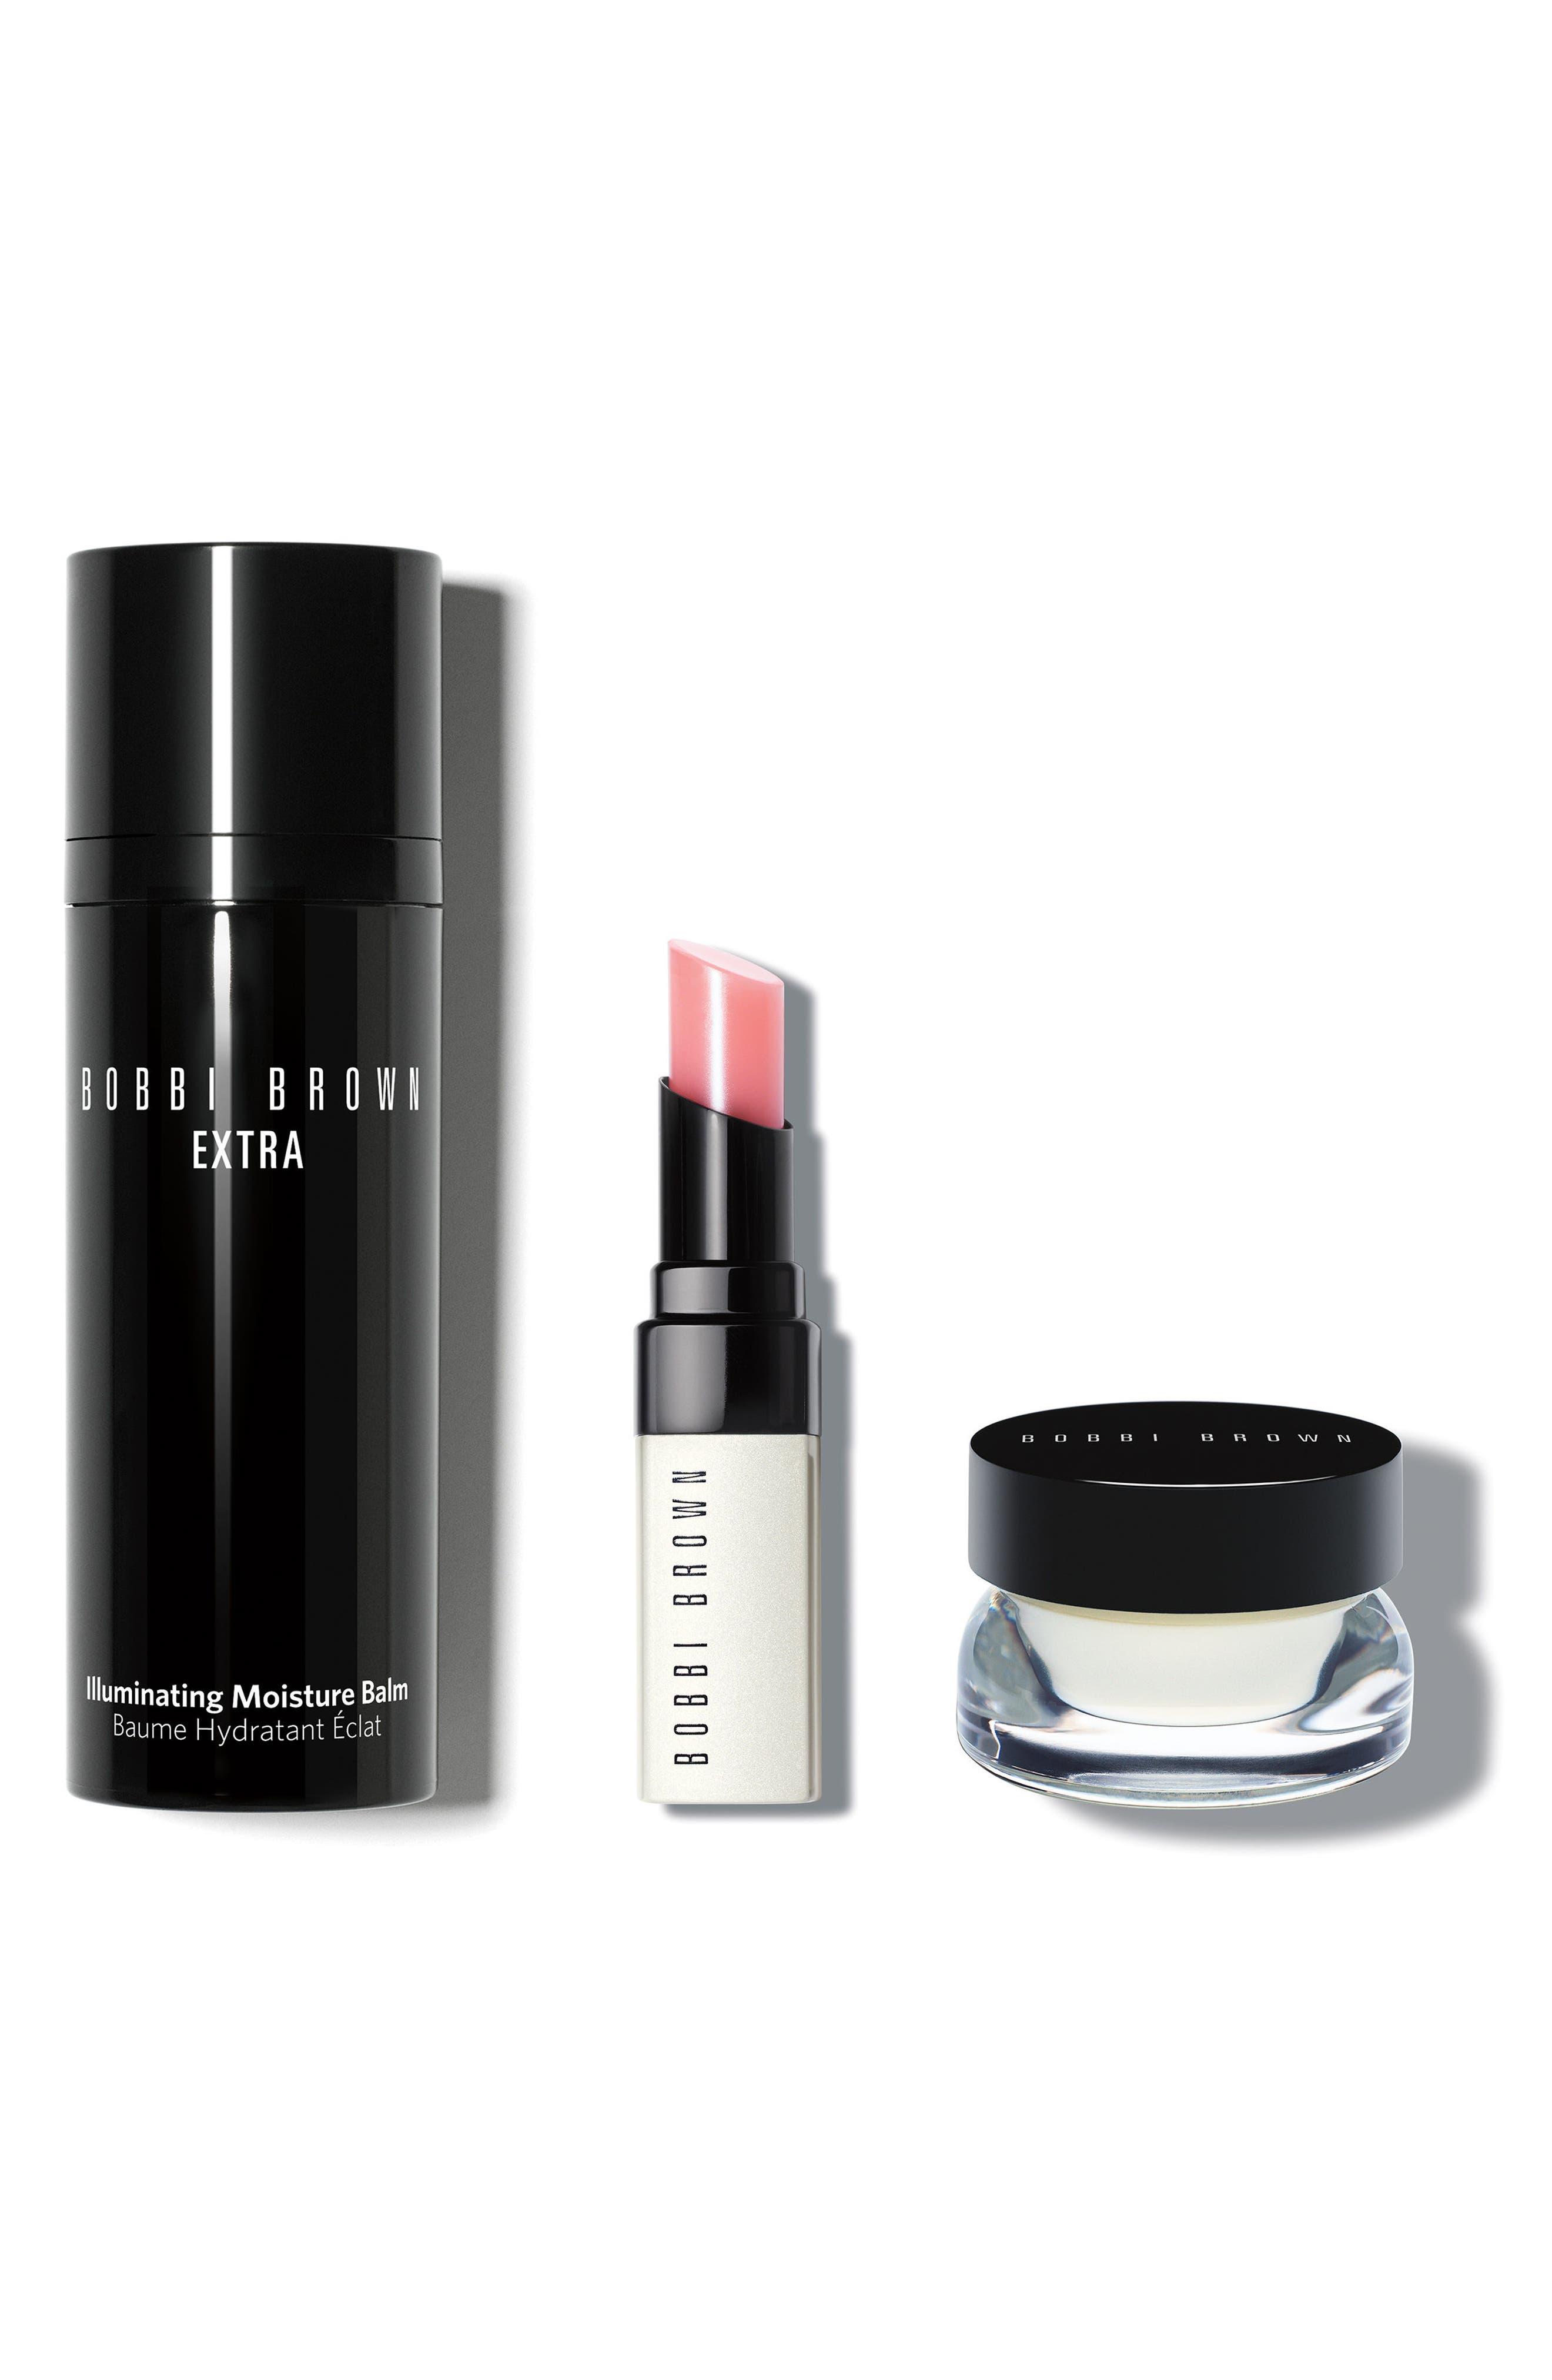 Bobbi Brown Extra Glow Skin Care Set ($175 Value)